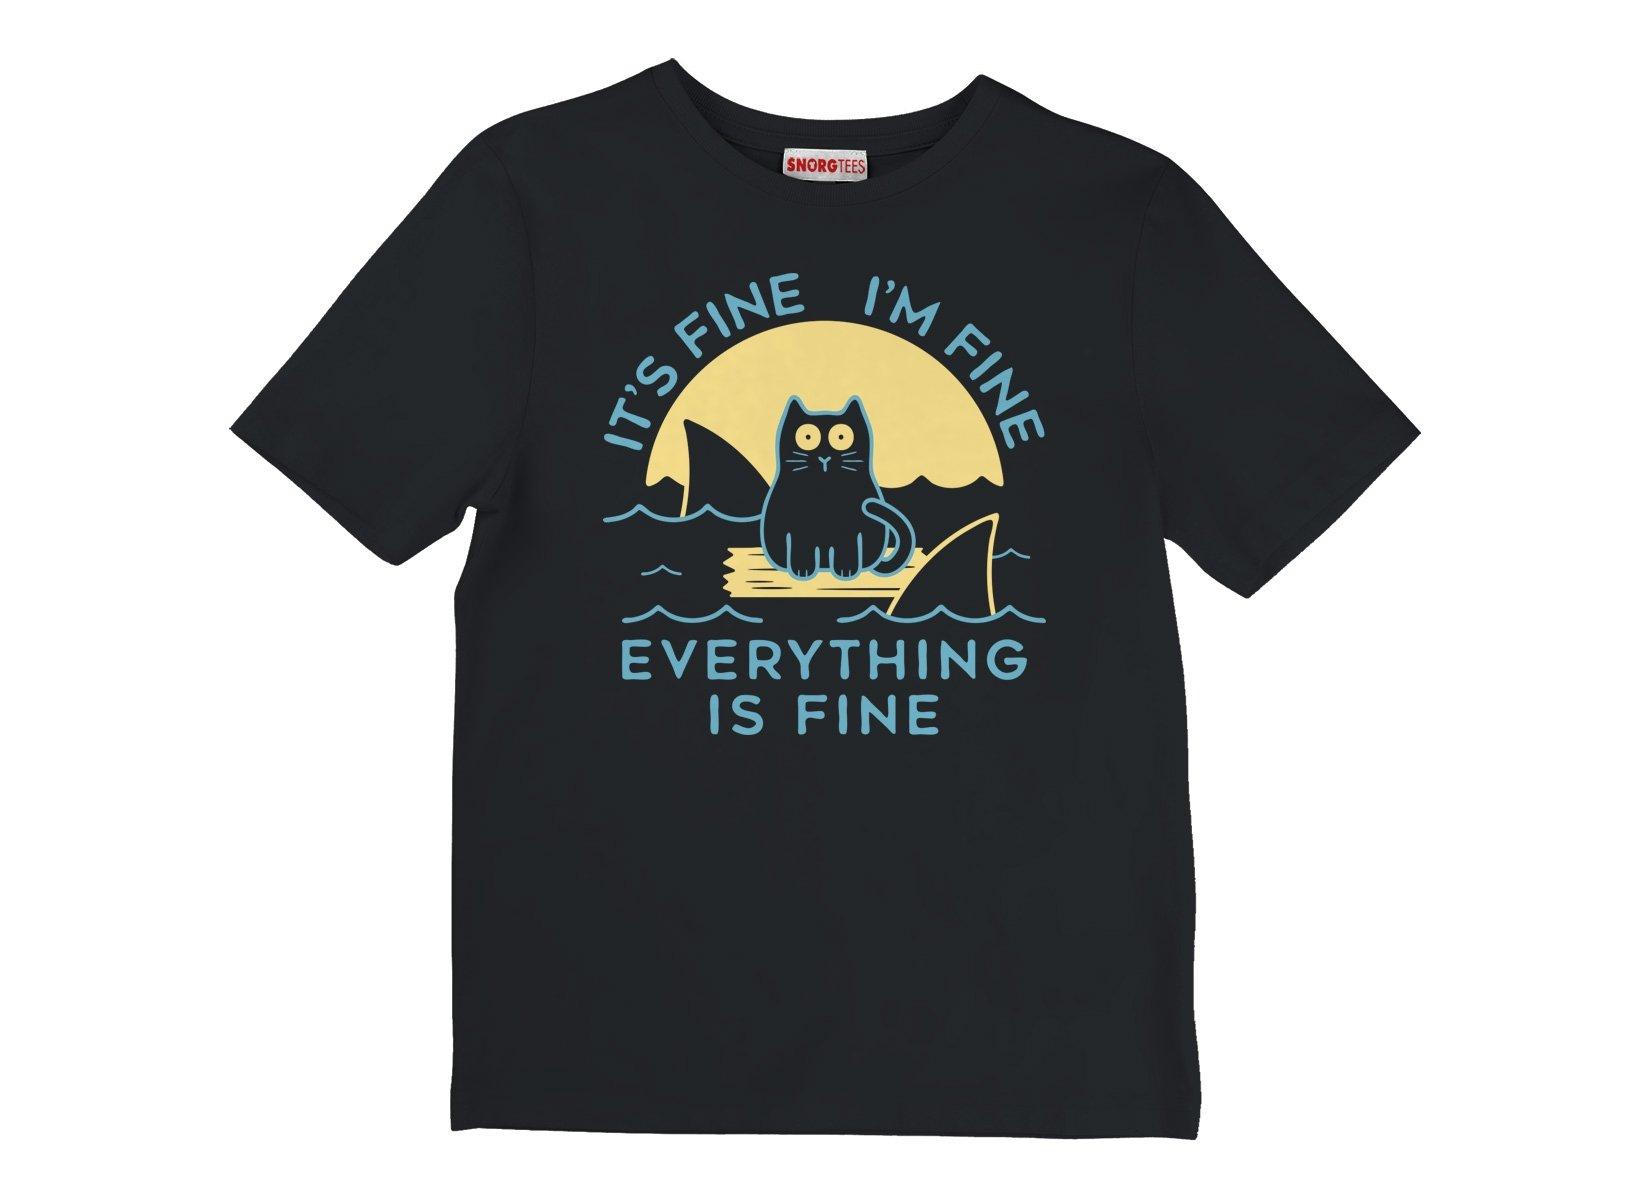 It's Fine I'm Fine Everything Is Fine on Kids T-Shirt